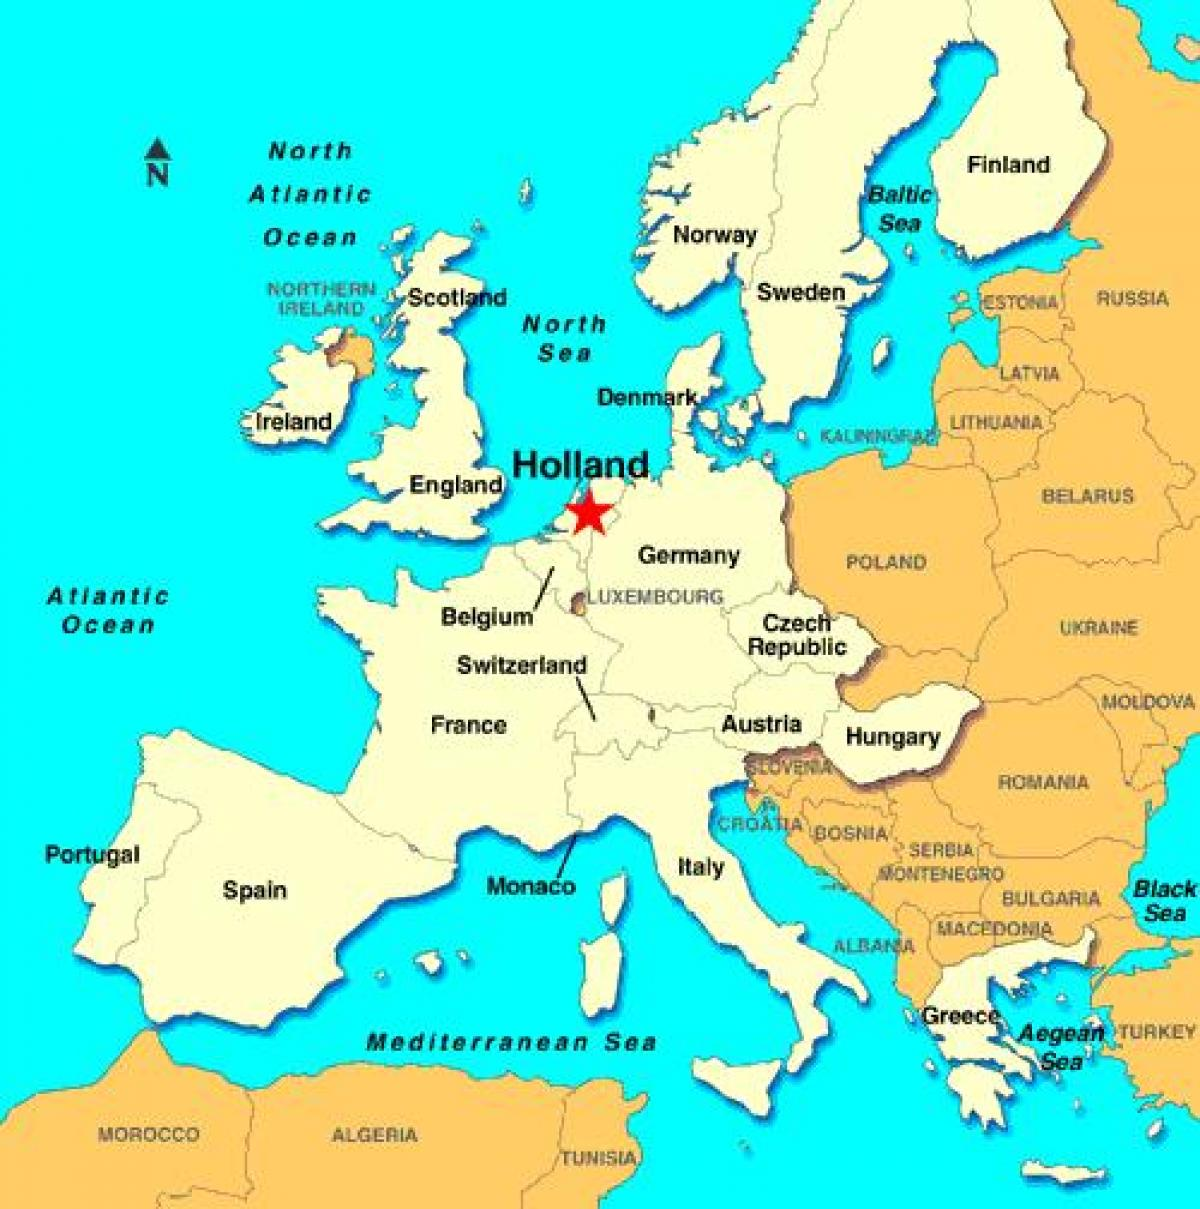 karta holland Holland karta europa   Karta över Holland europa (Väst Europa  karta holland